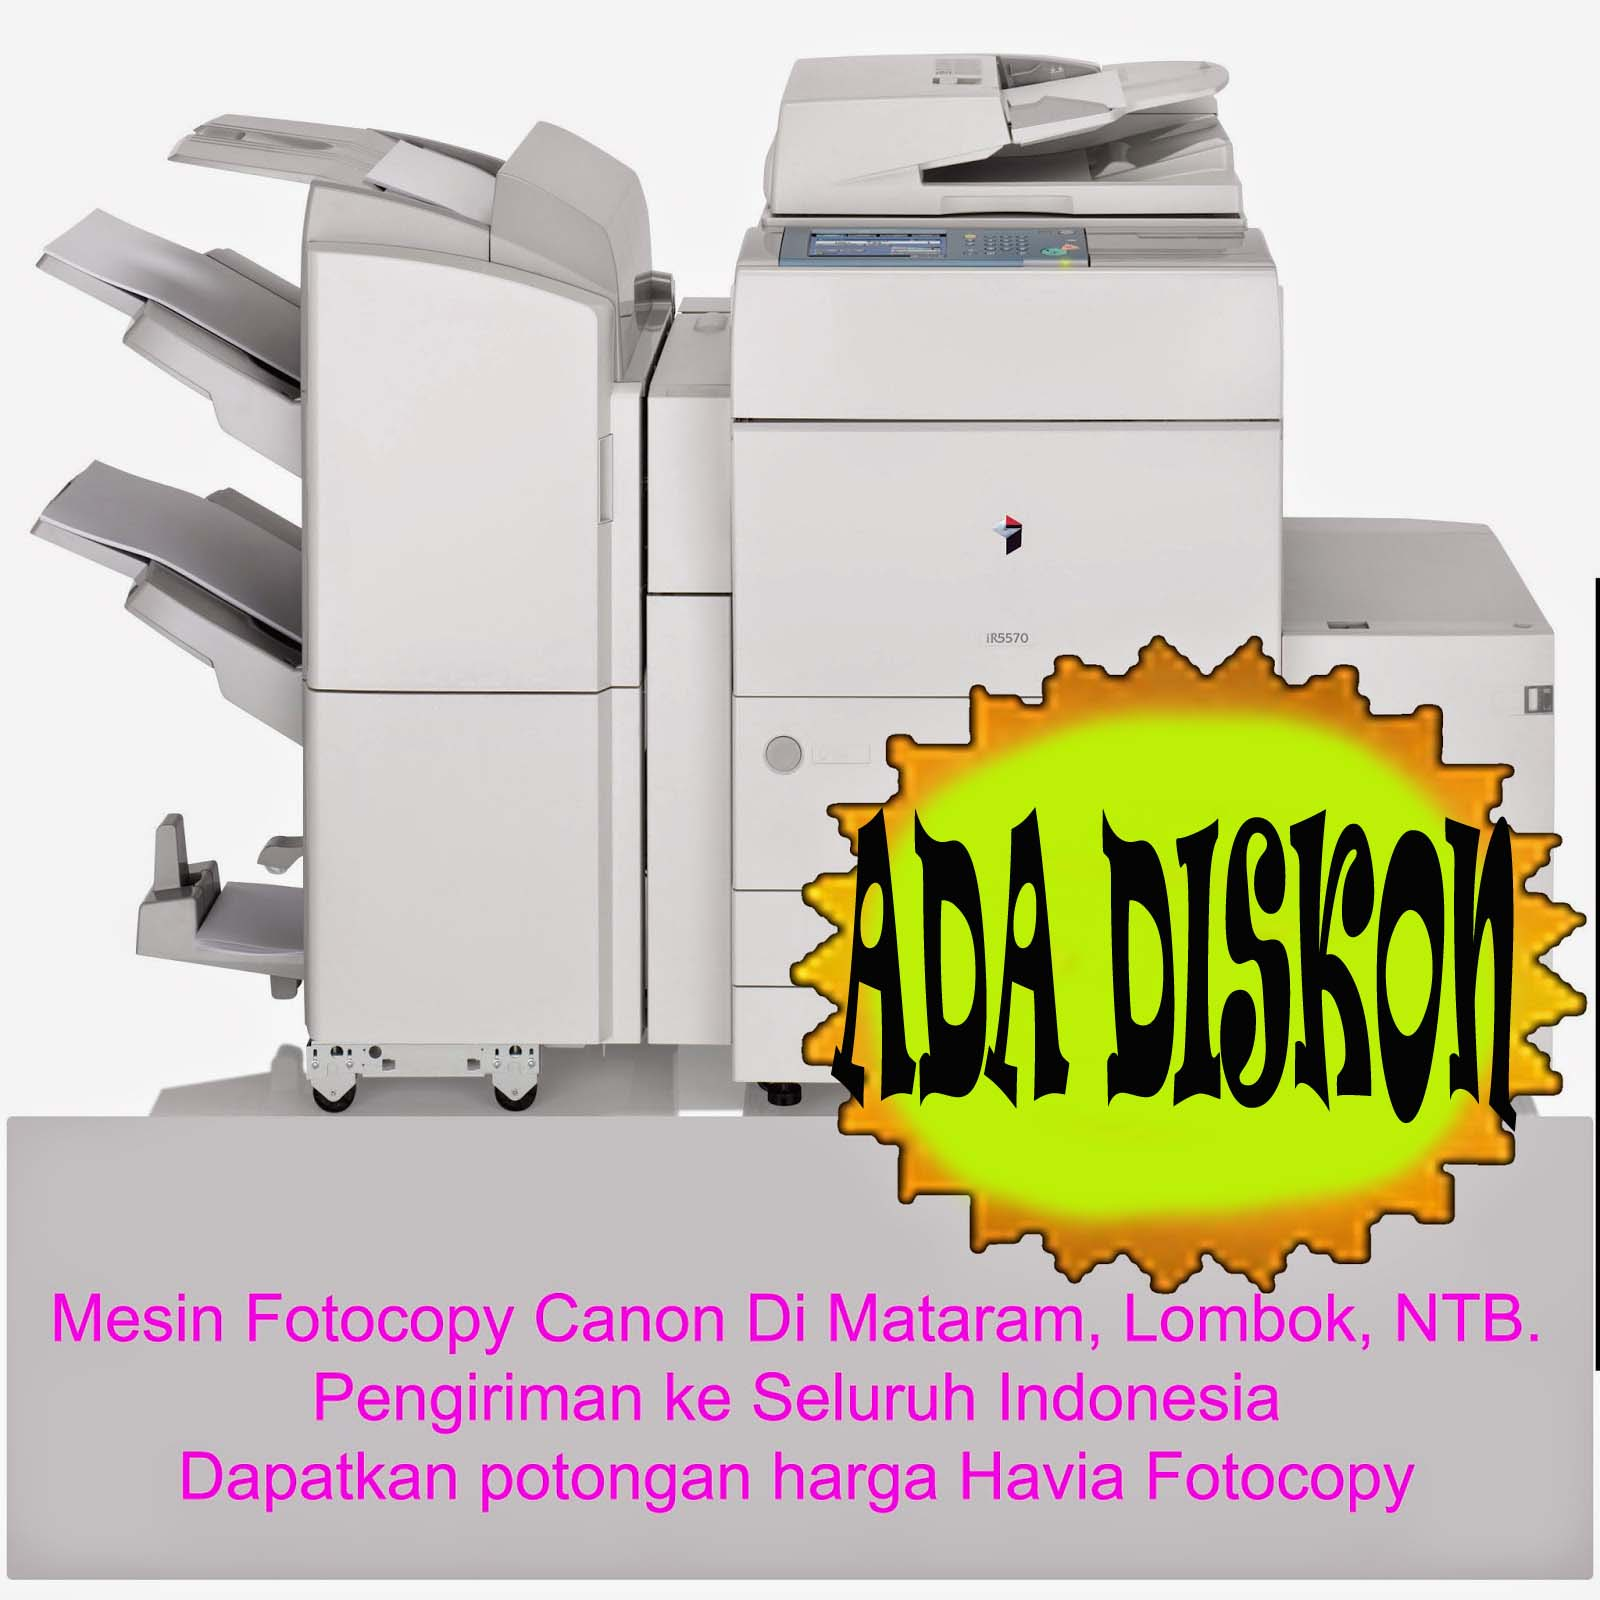 Havia Dealer Mesin Fotocopy Canon Resmi Seluruh Indonesia - Memberikan Diskon Kepada Pembeli